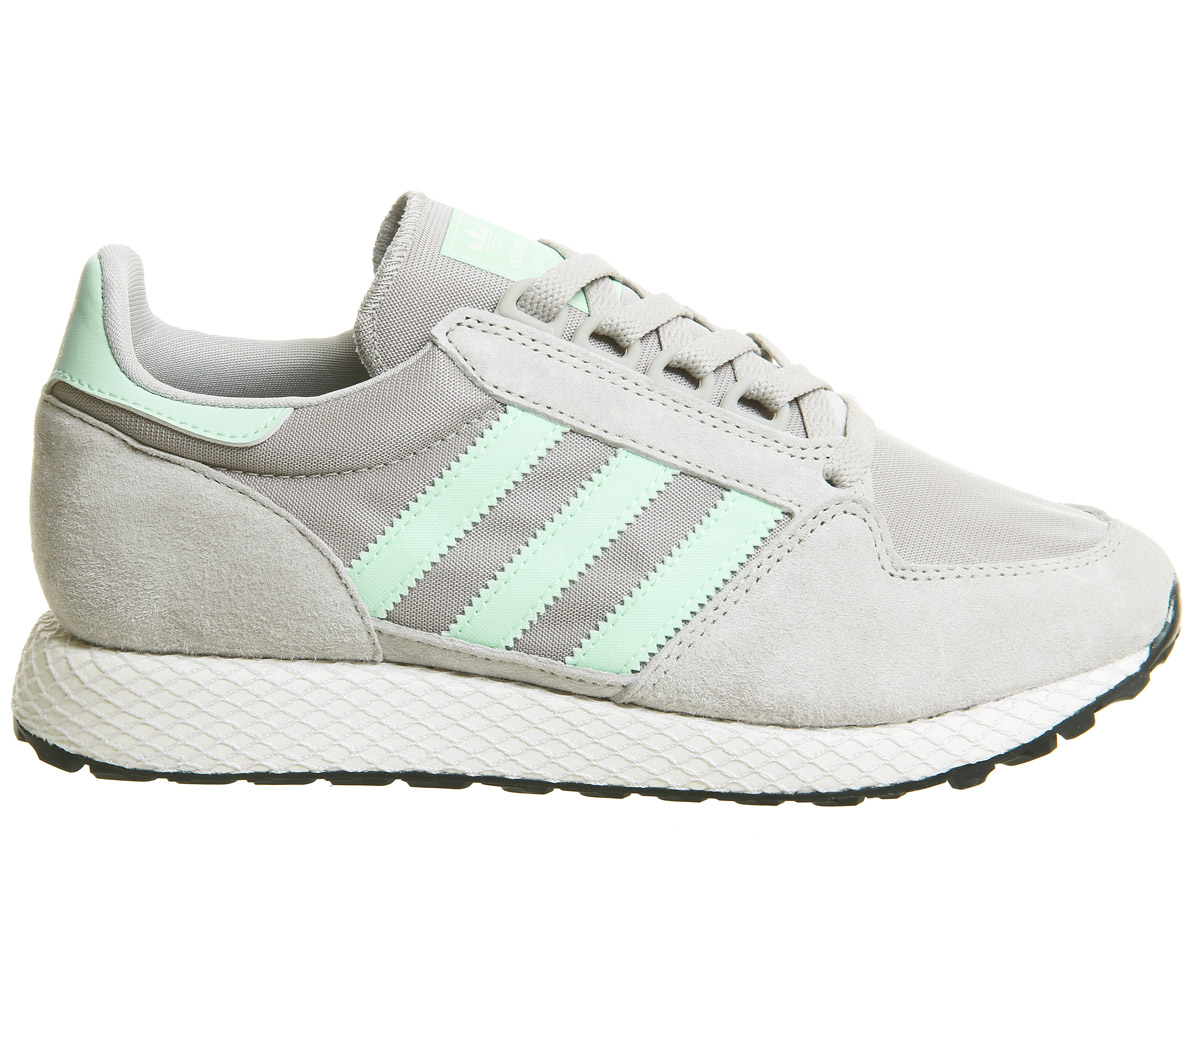 best service 678f5 5a5d2 SENTINEL Womens Adidas Forest Grove formatori sesamo nero scarpe da  ginnastica scarpe bianco